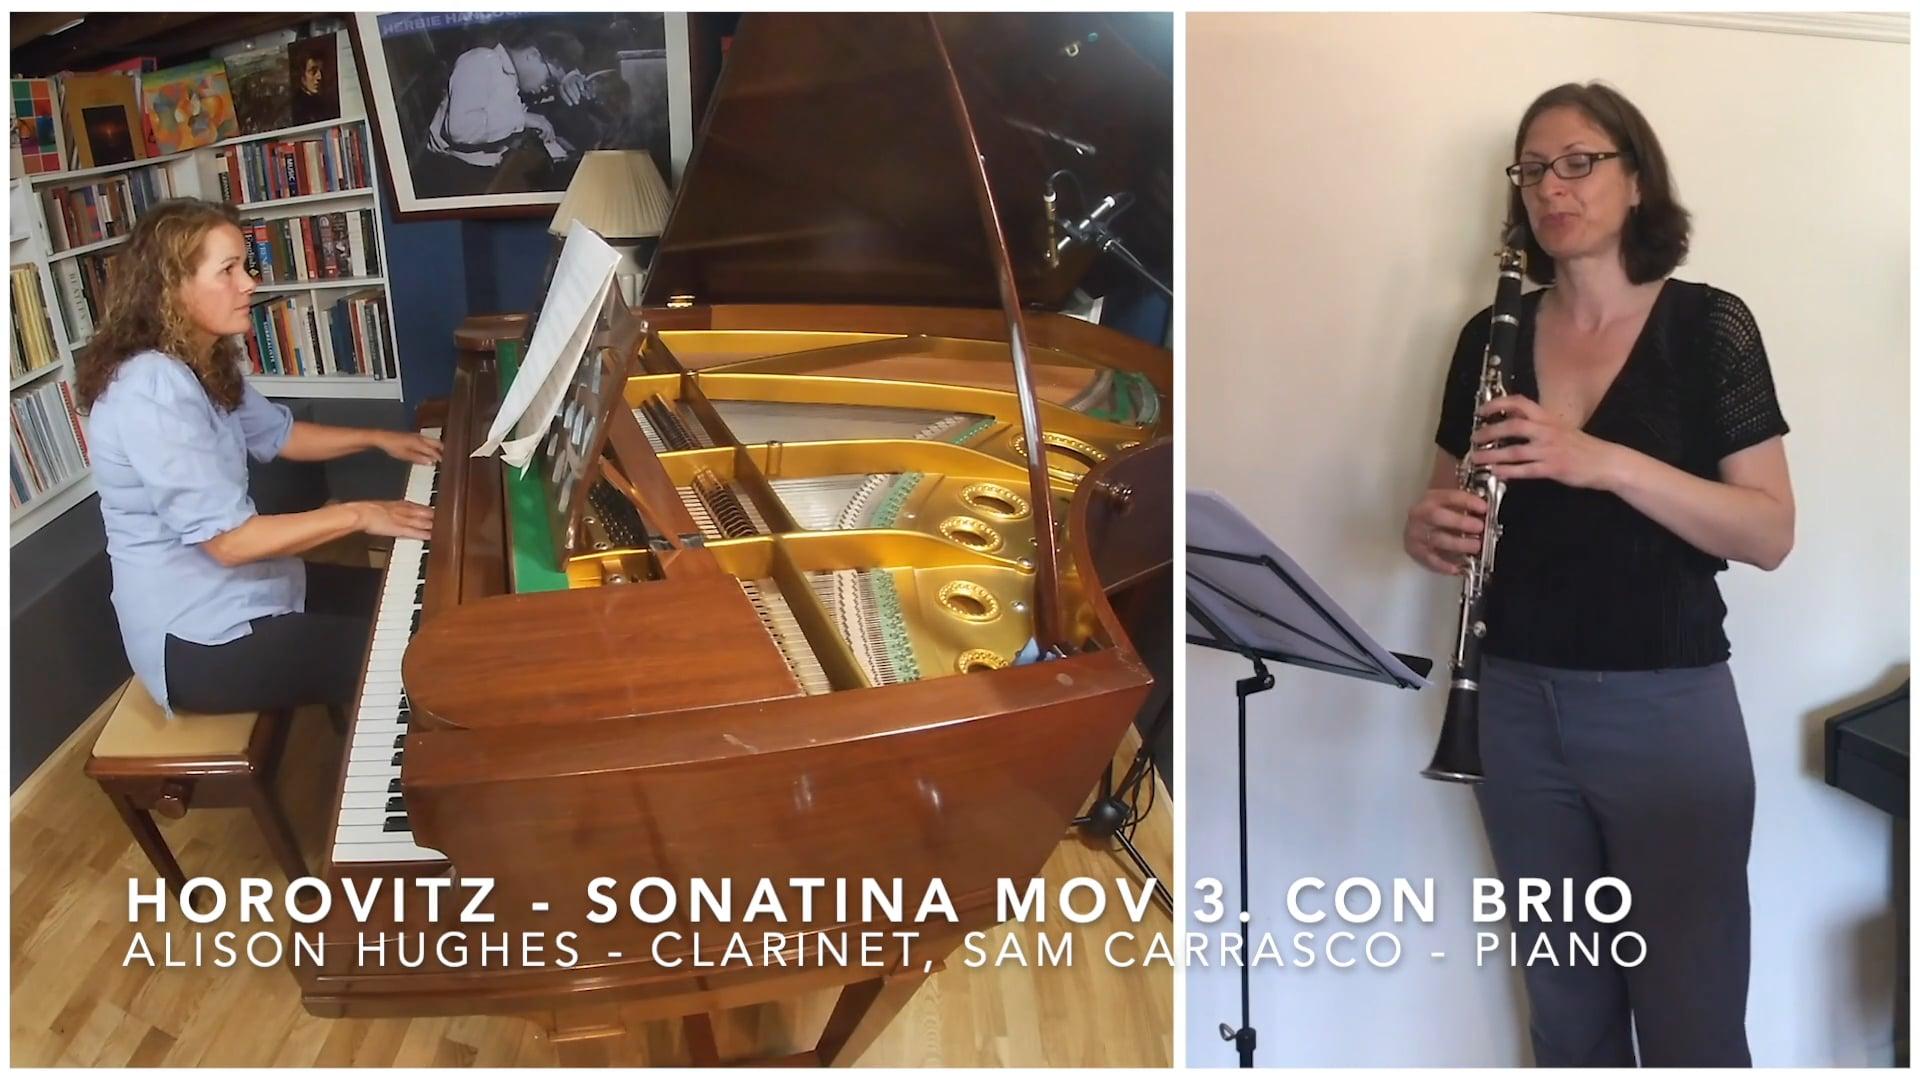 Joseph Horovitz - Sonatina for Clarinet & Piano, Mov 3 Con brio - Alison Hughes & Samantha Carrasco